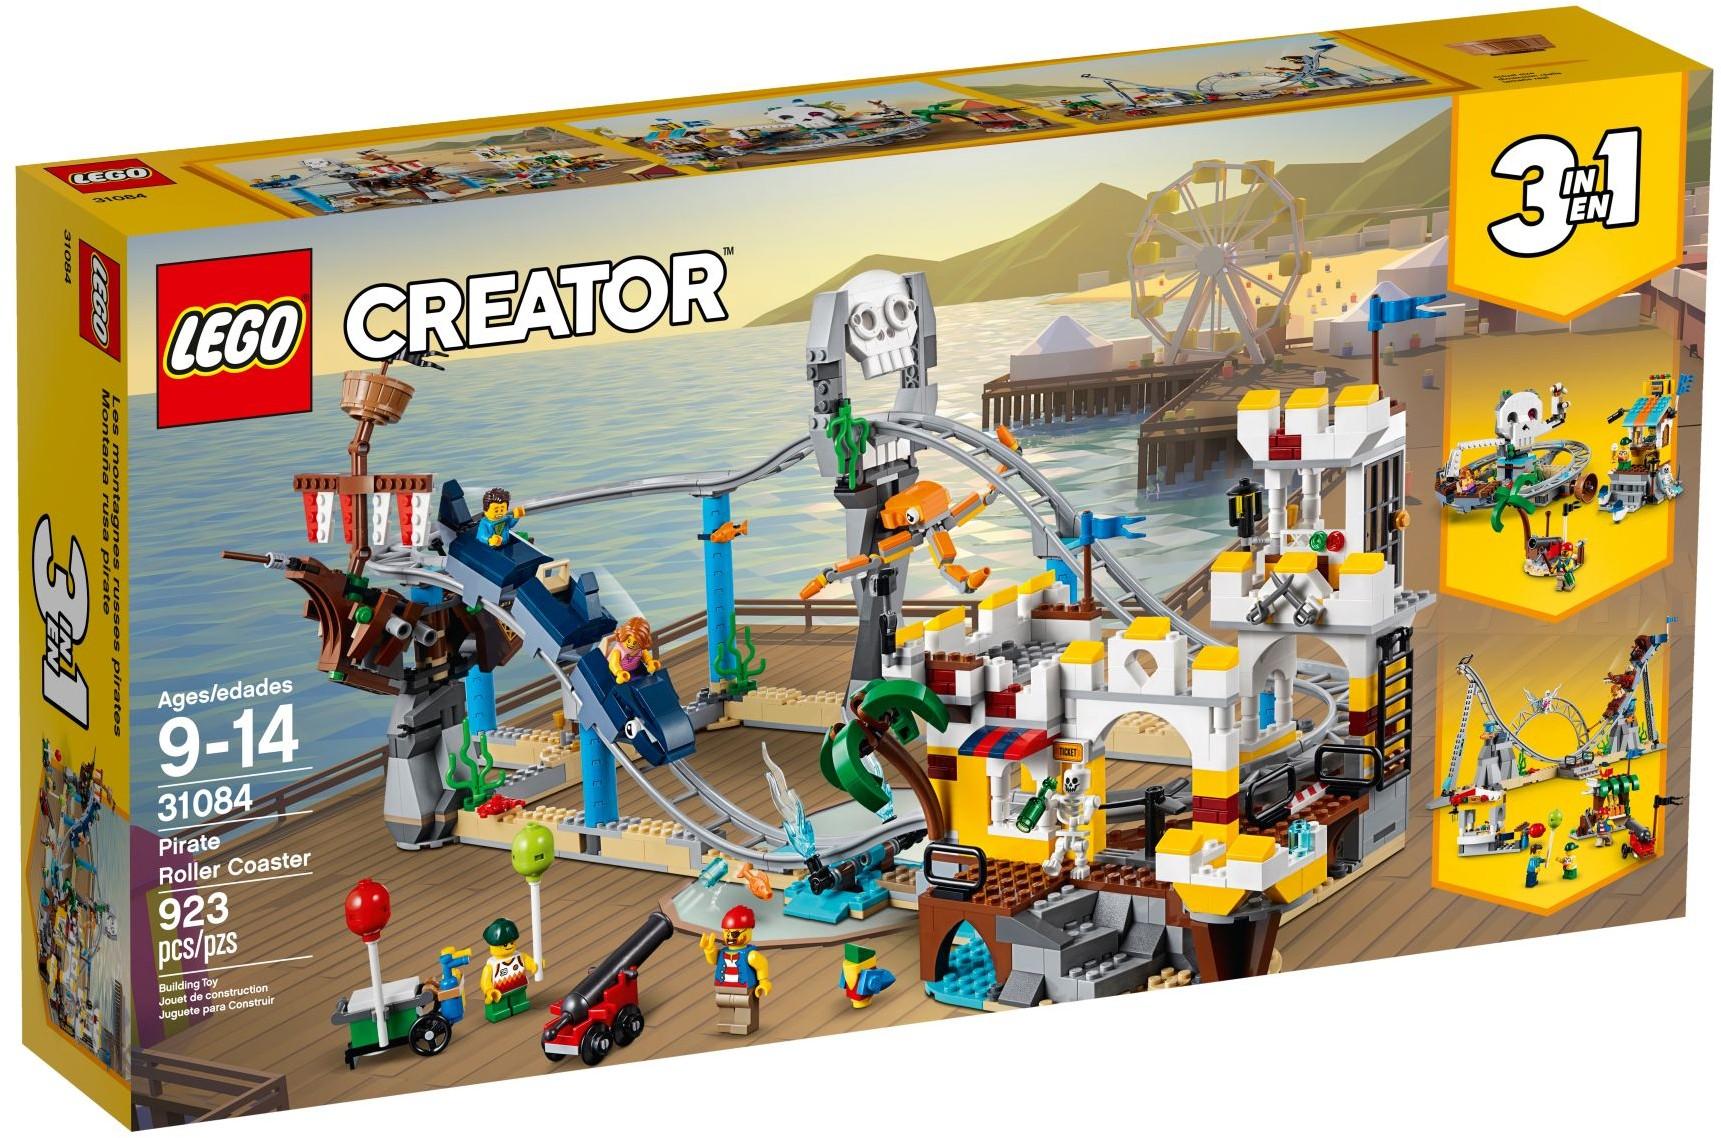 31084 Pirate Roller Coaster